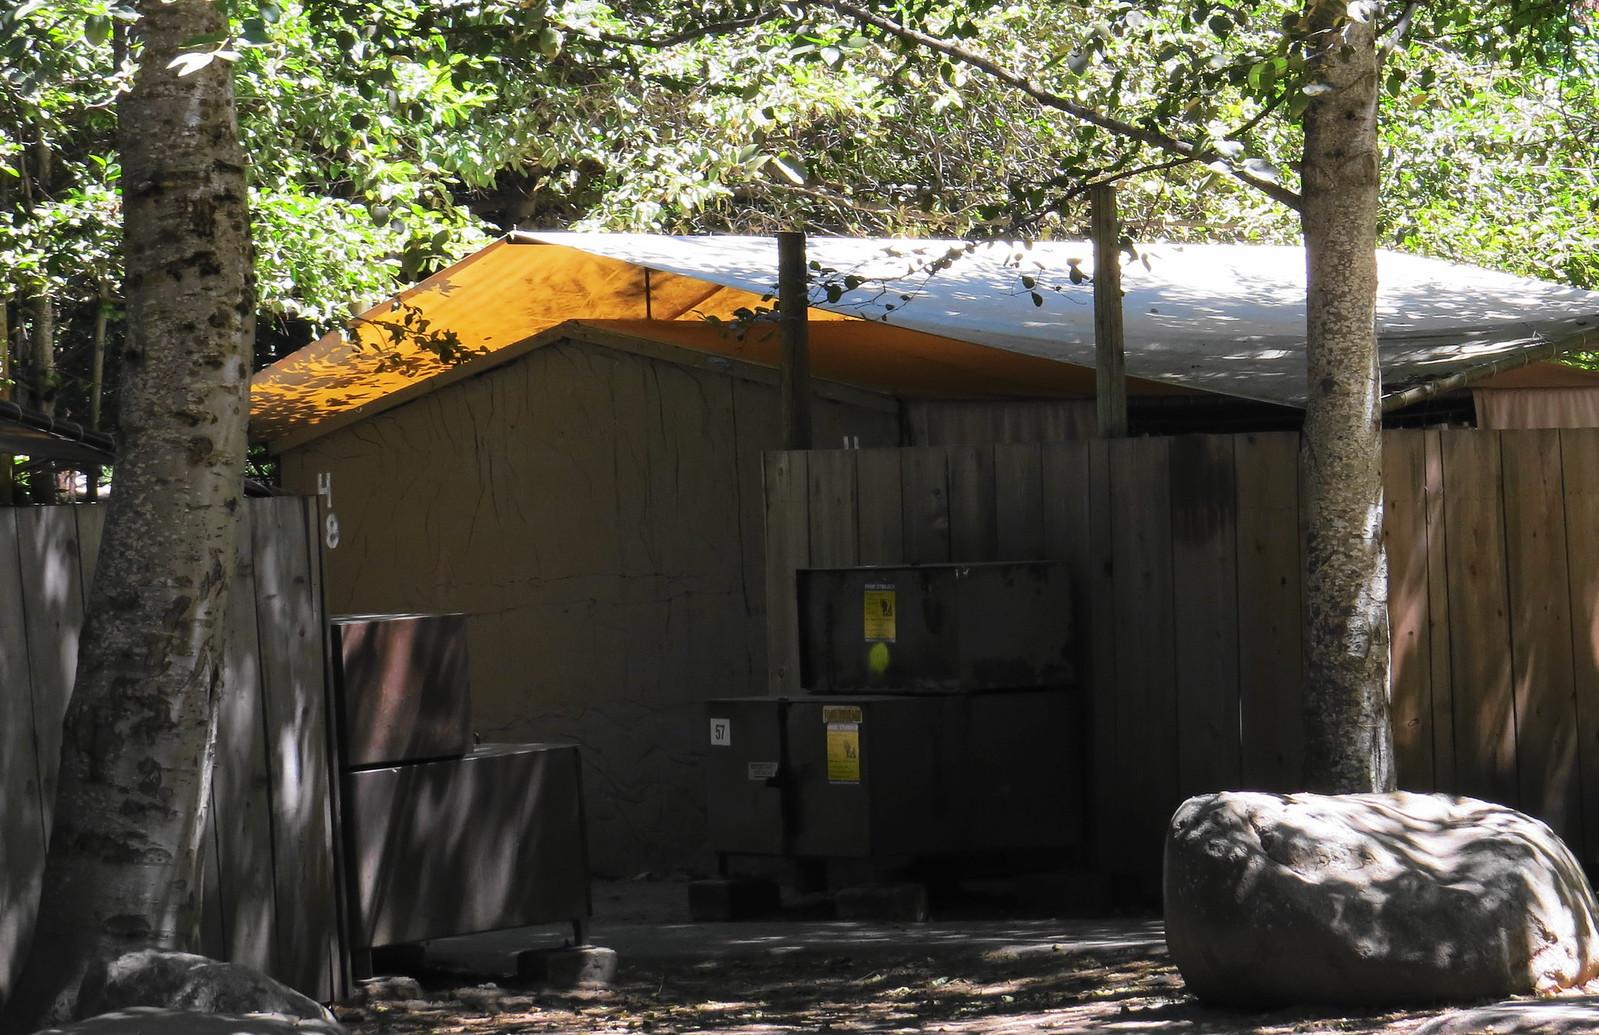 Housekeeping Camp, Yosemite Valley, CA